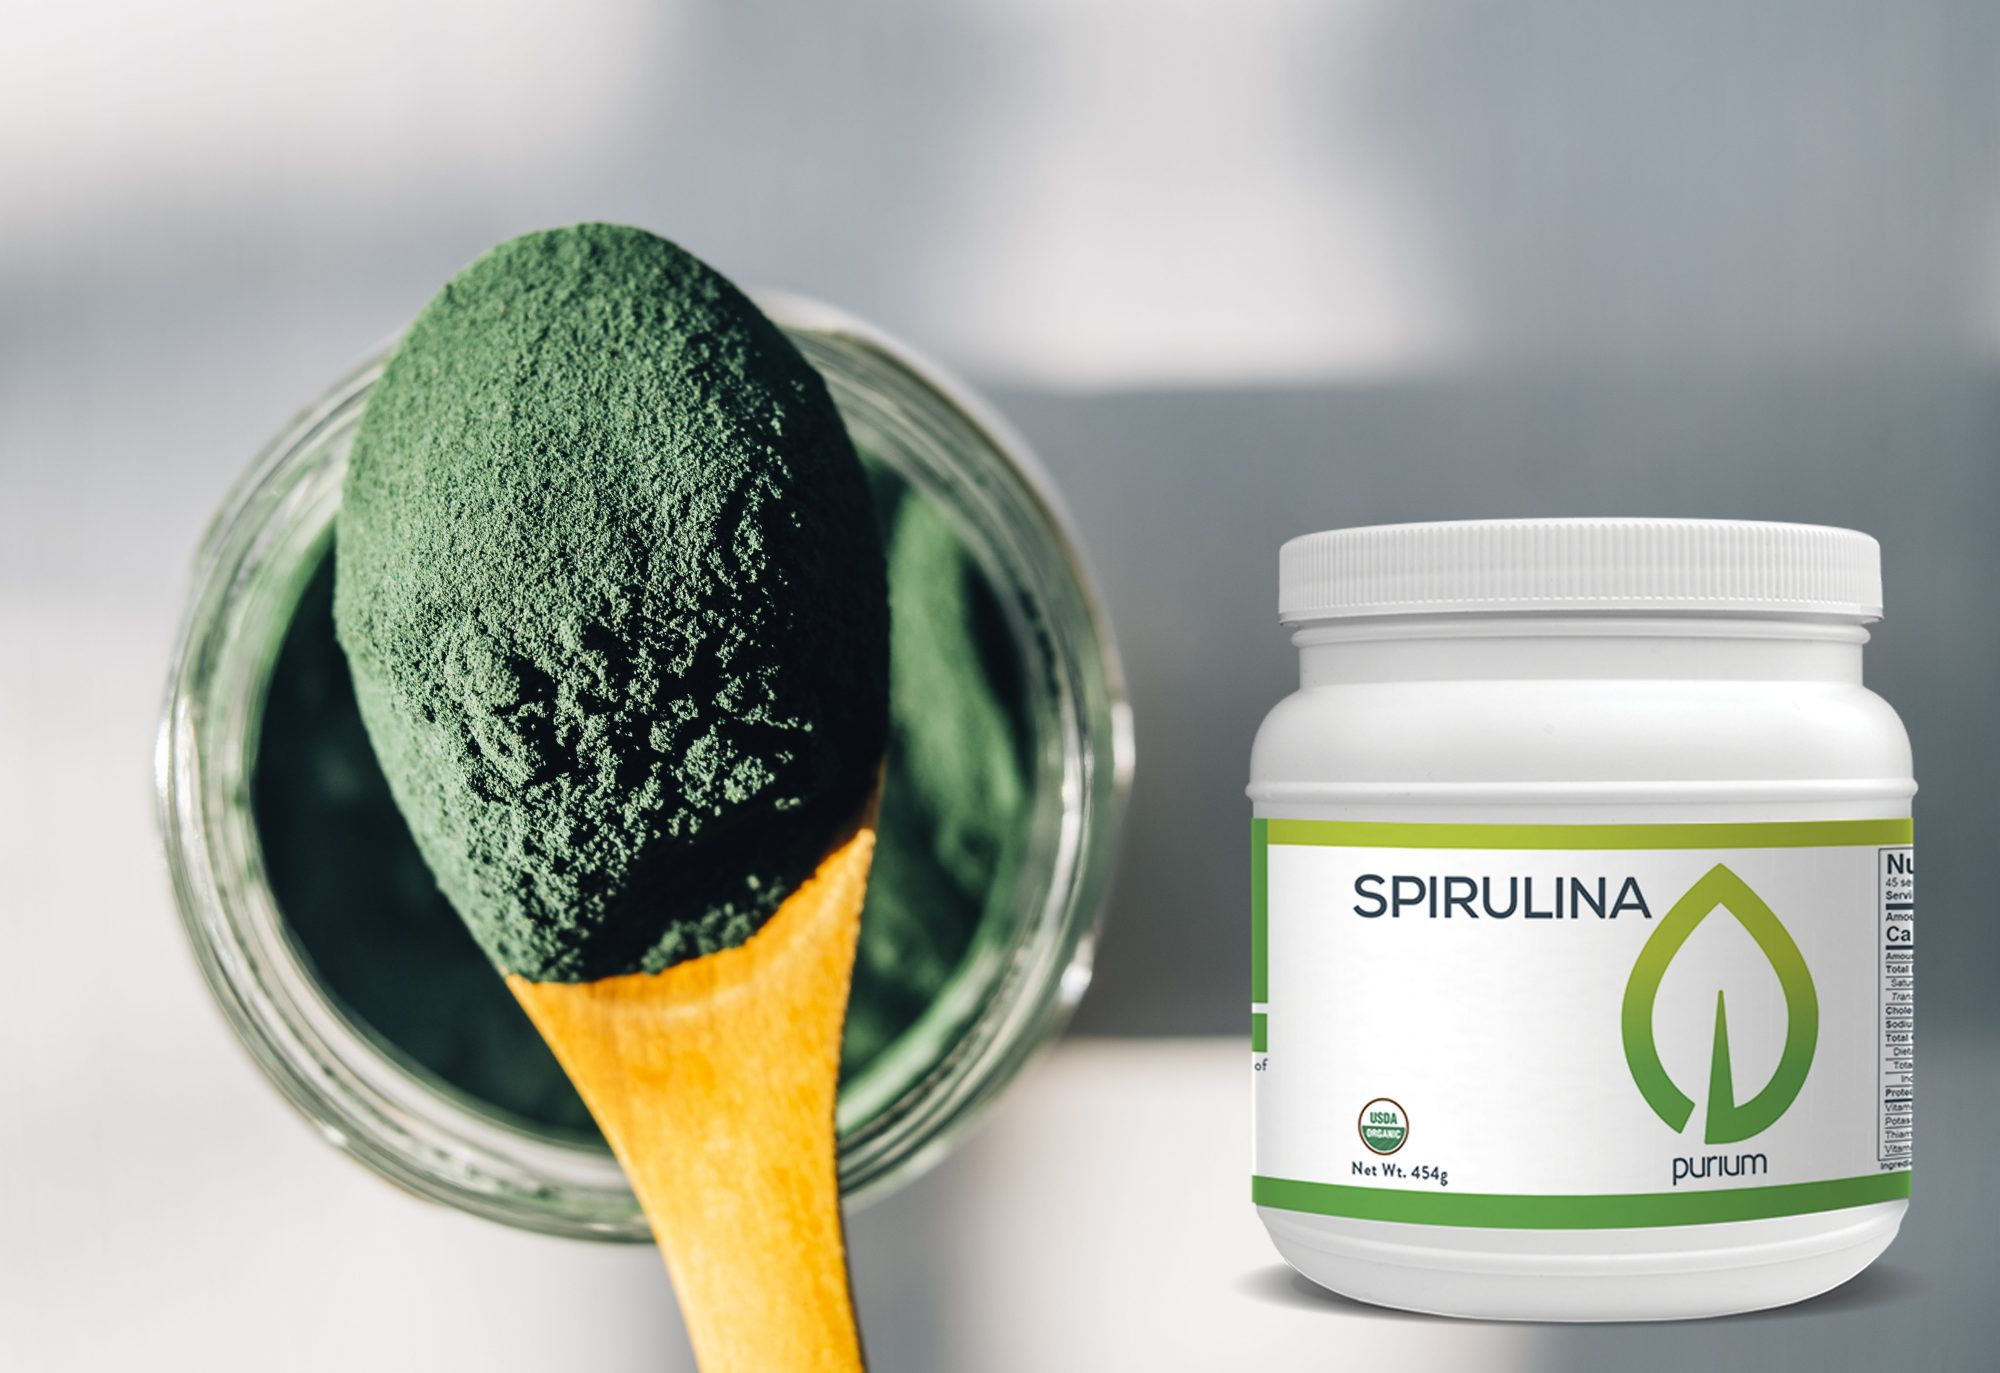 Spirulina: Mother Nature's Multivitamin